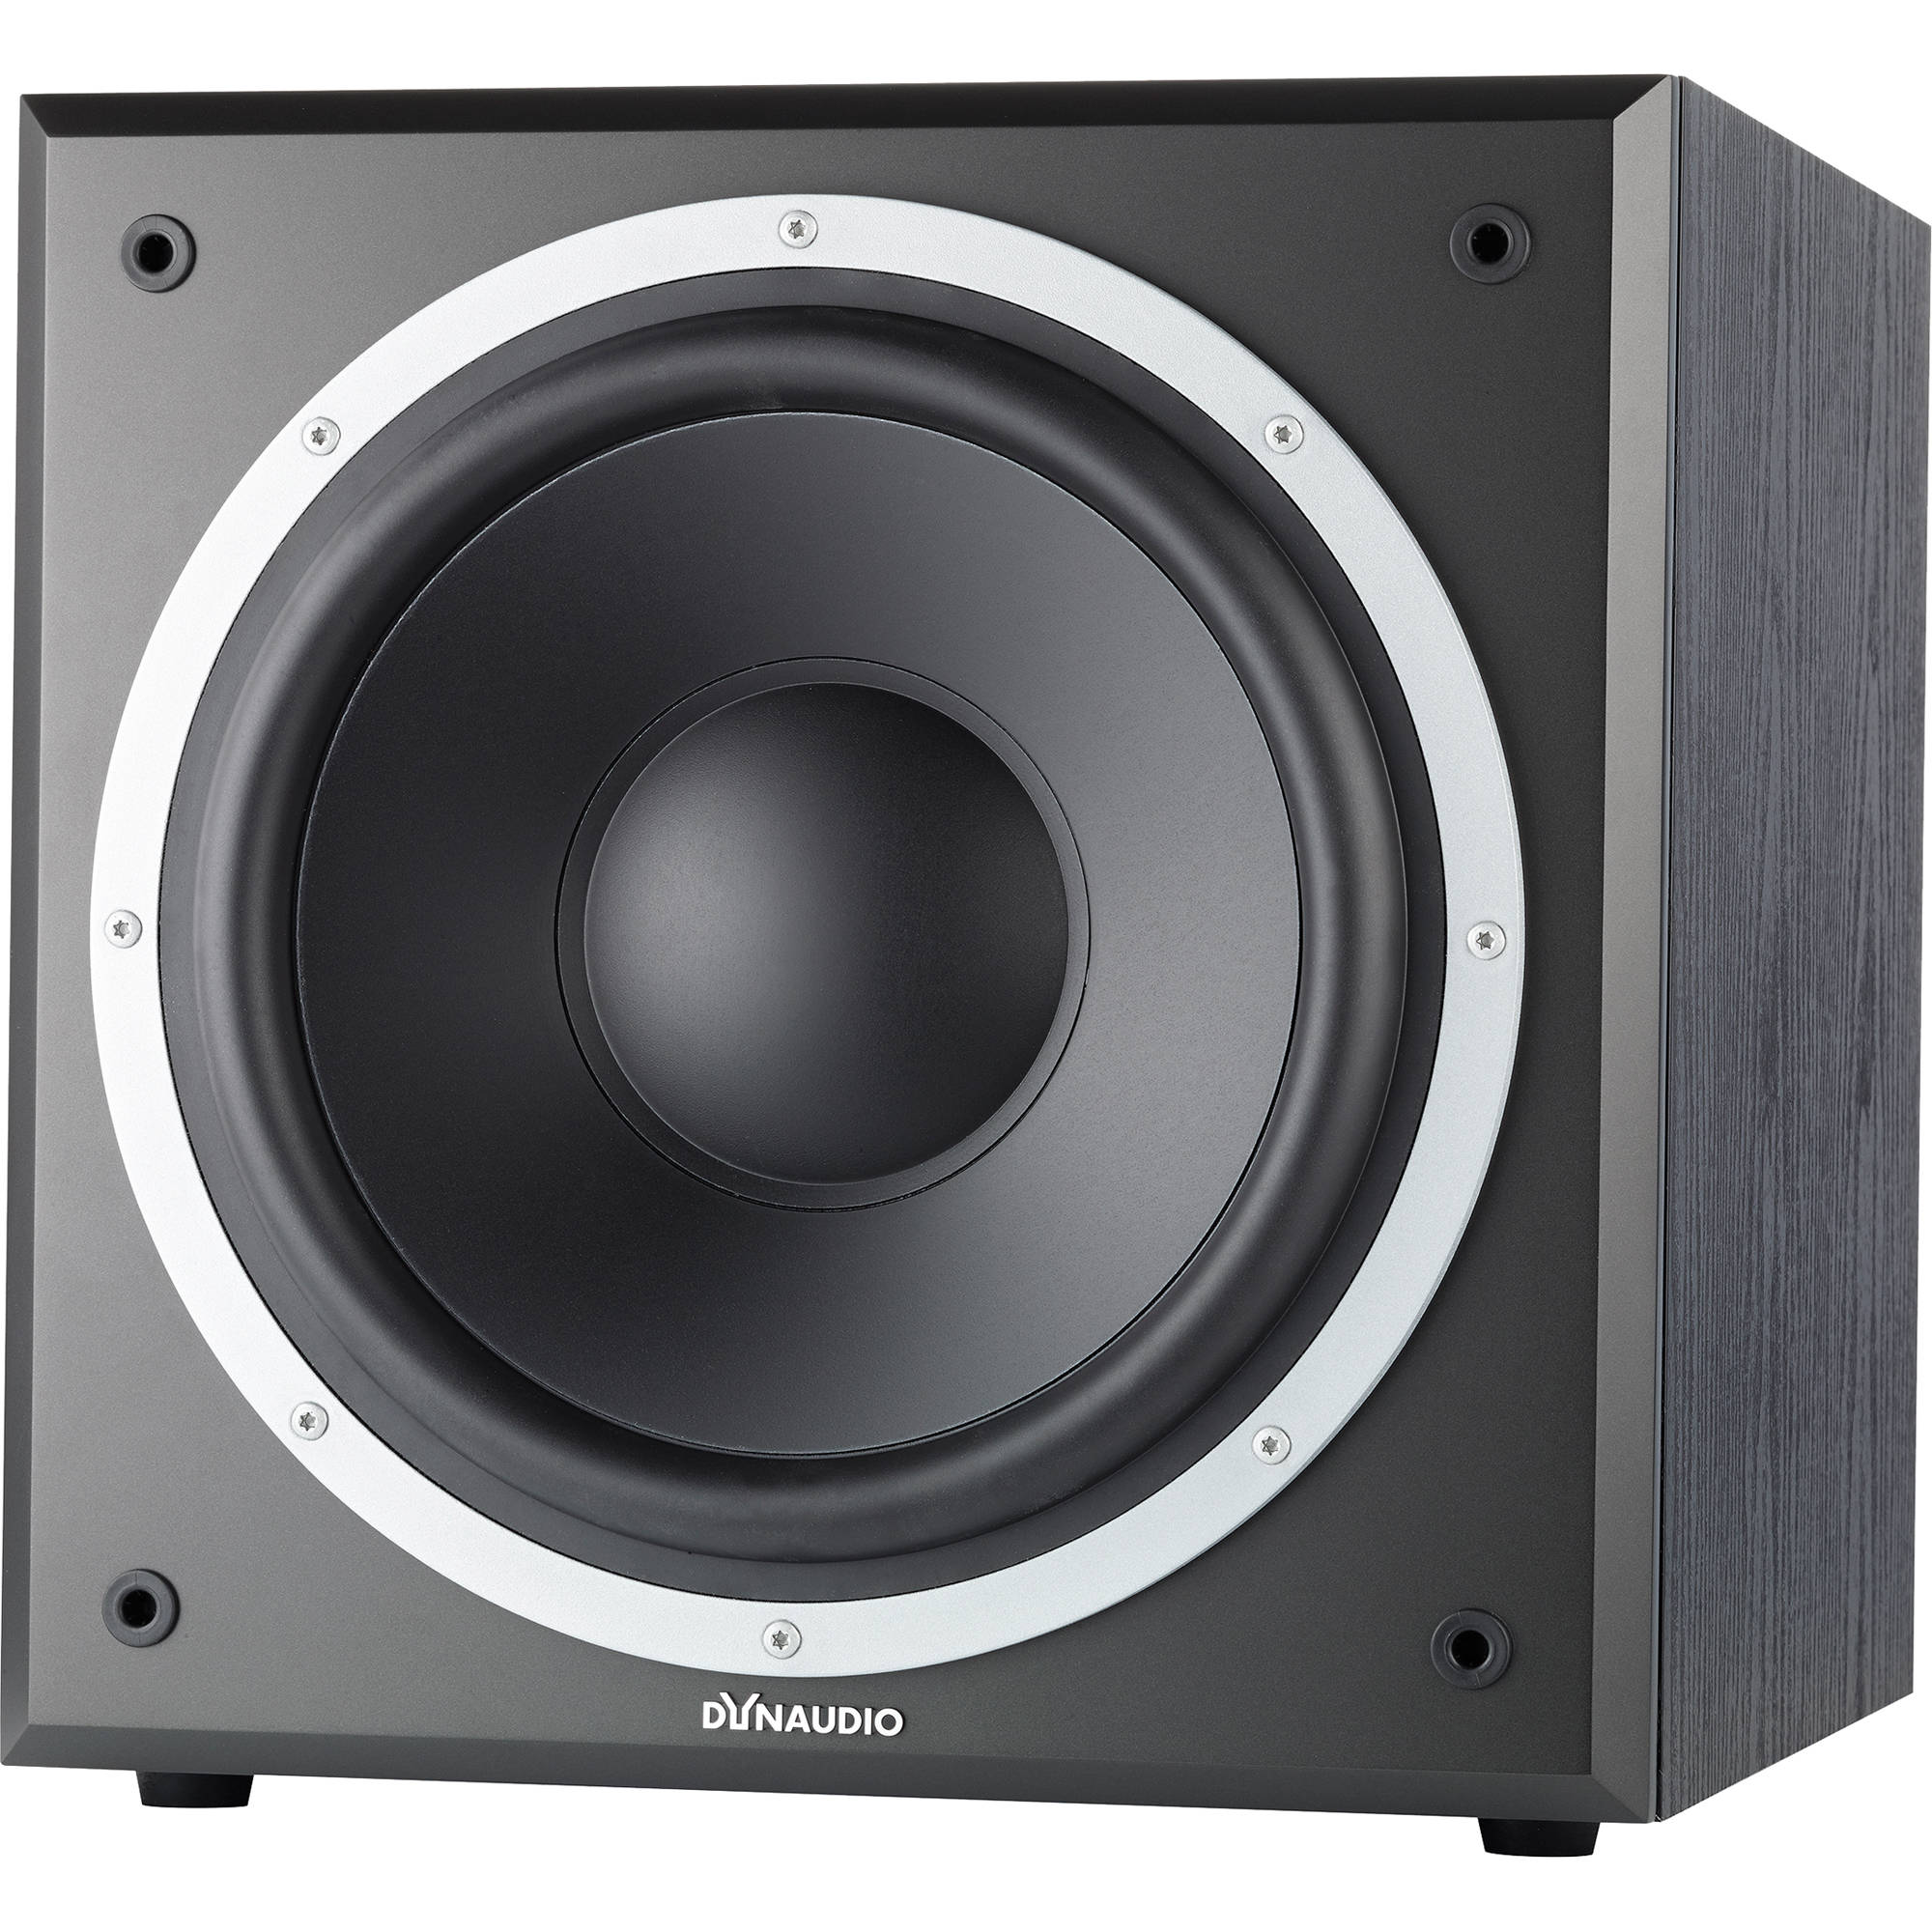 dynaudio acoustics bm14s ii 12 active studio bm14sii. Black Bedroom Furniture Sets. Home Design Ideas